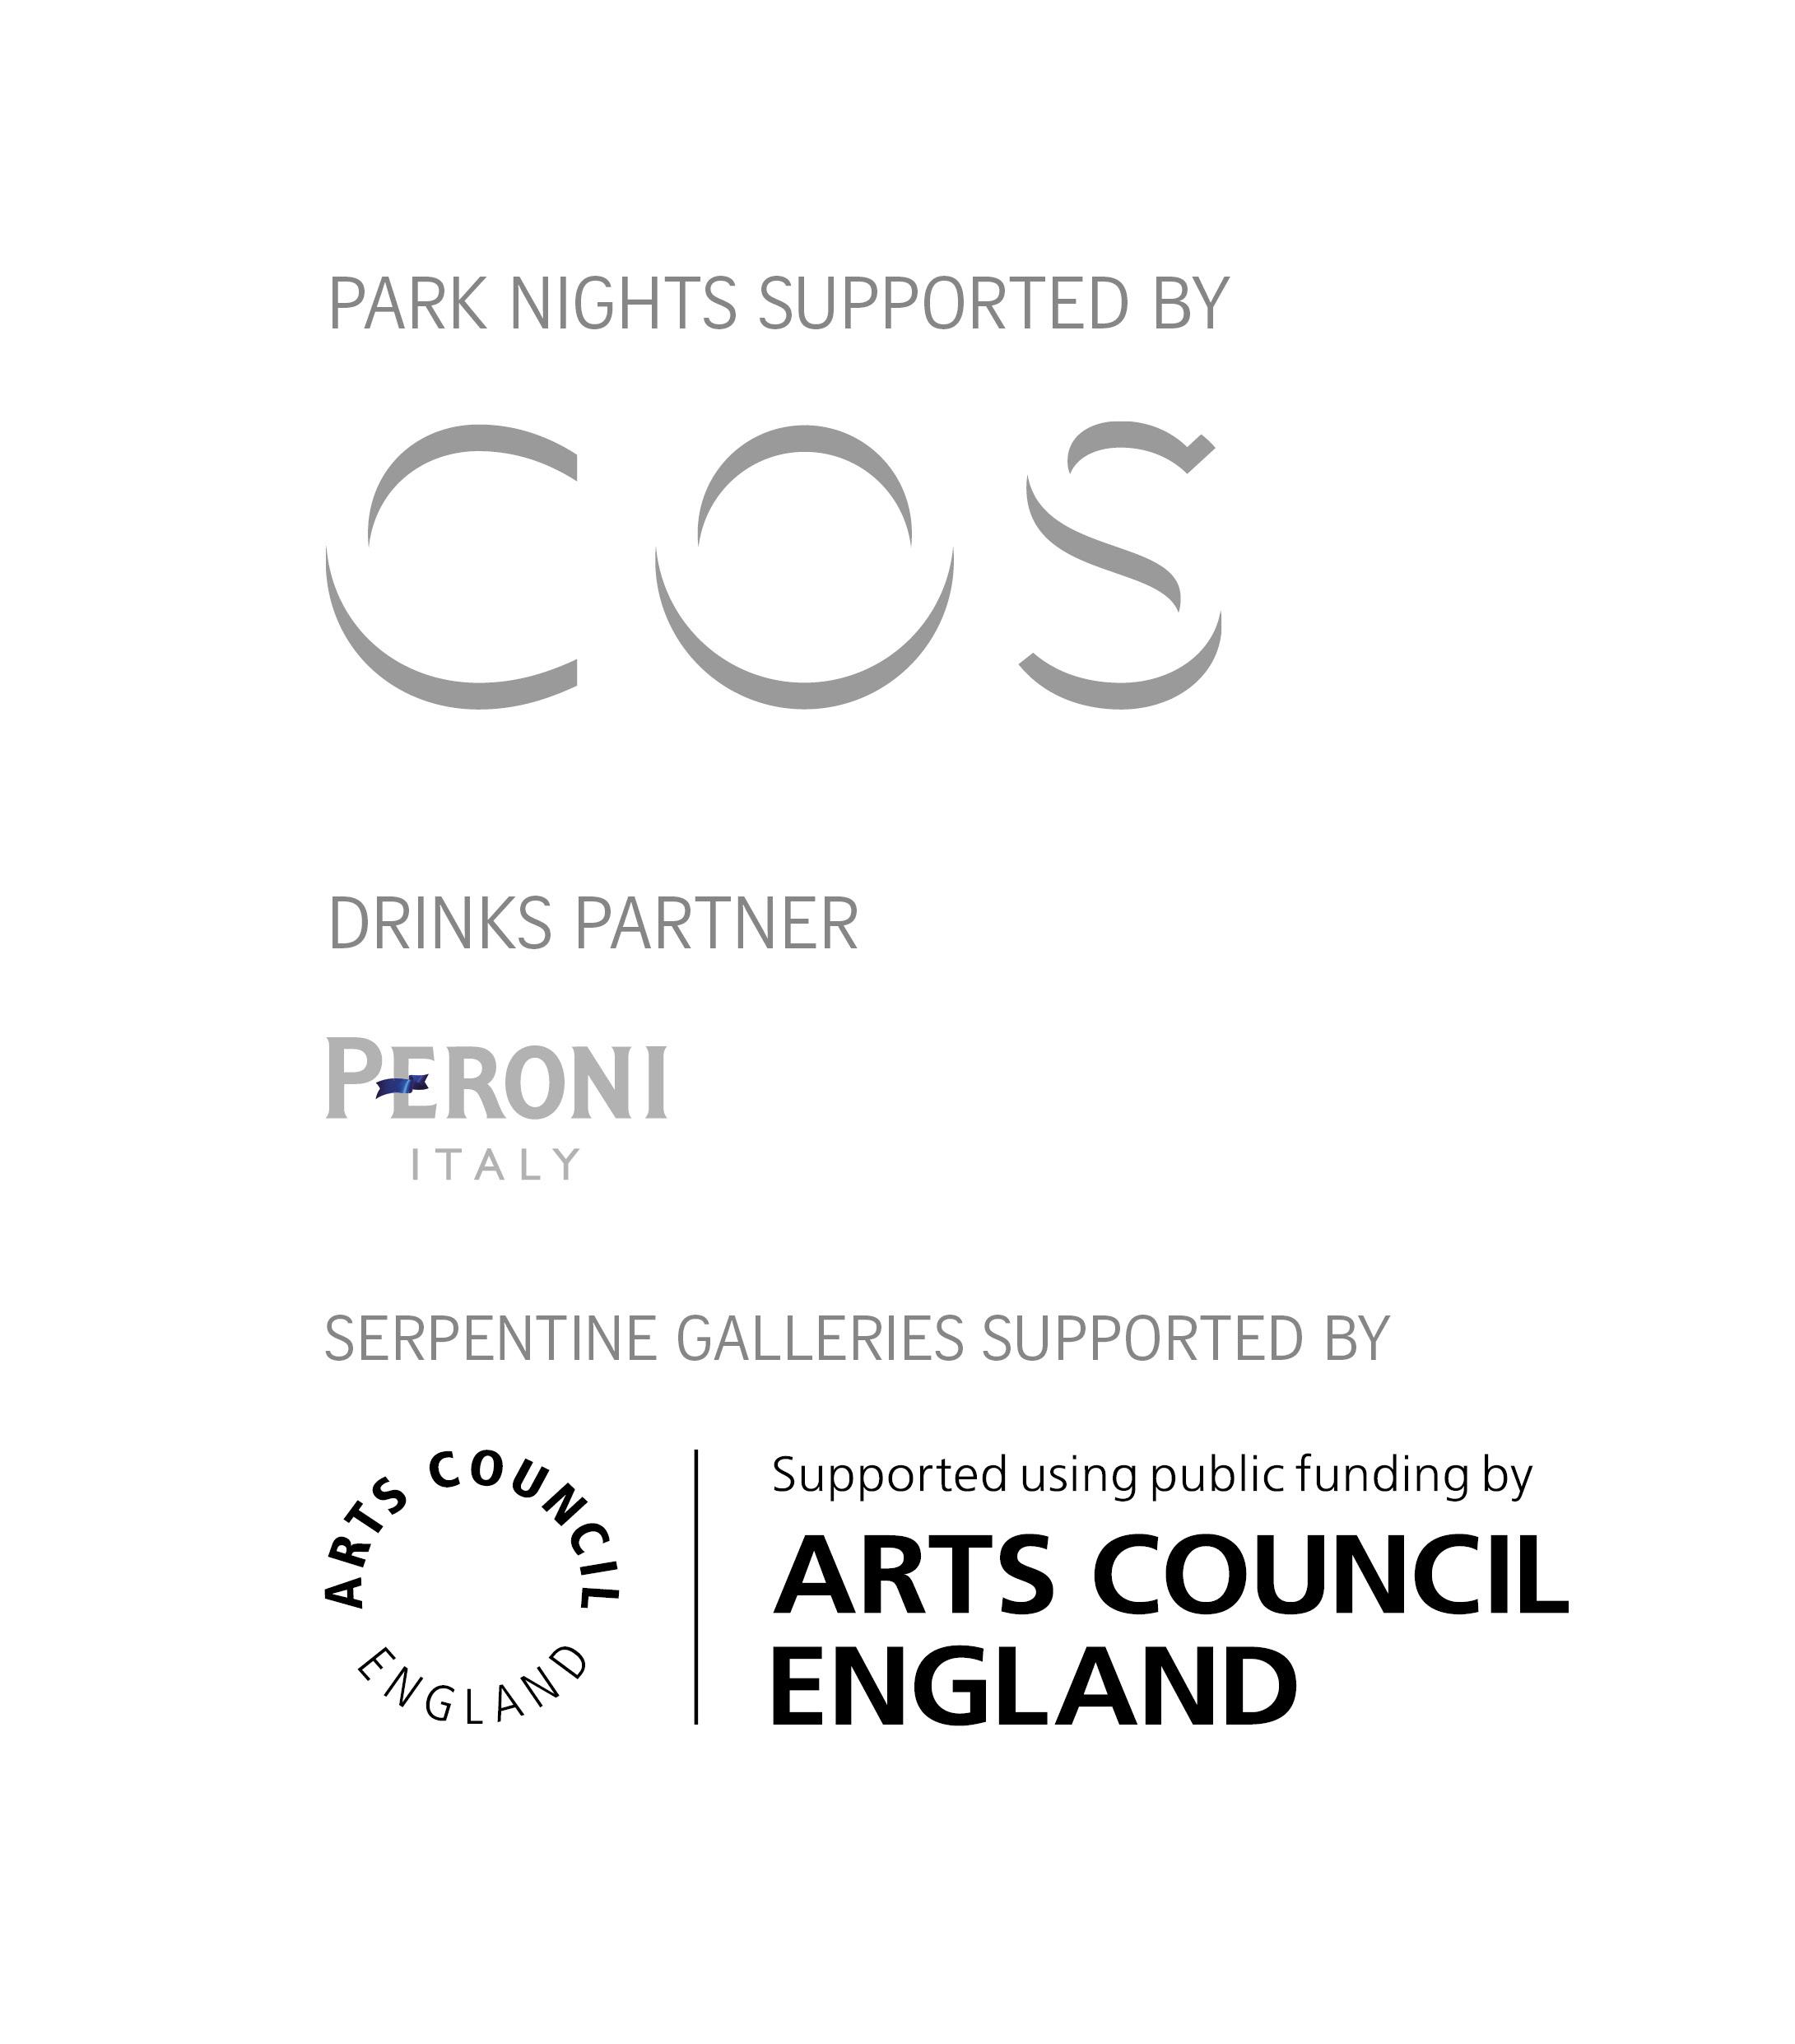 park_nights_logo_block_08.06.2017_crop.jpg